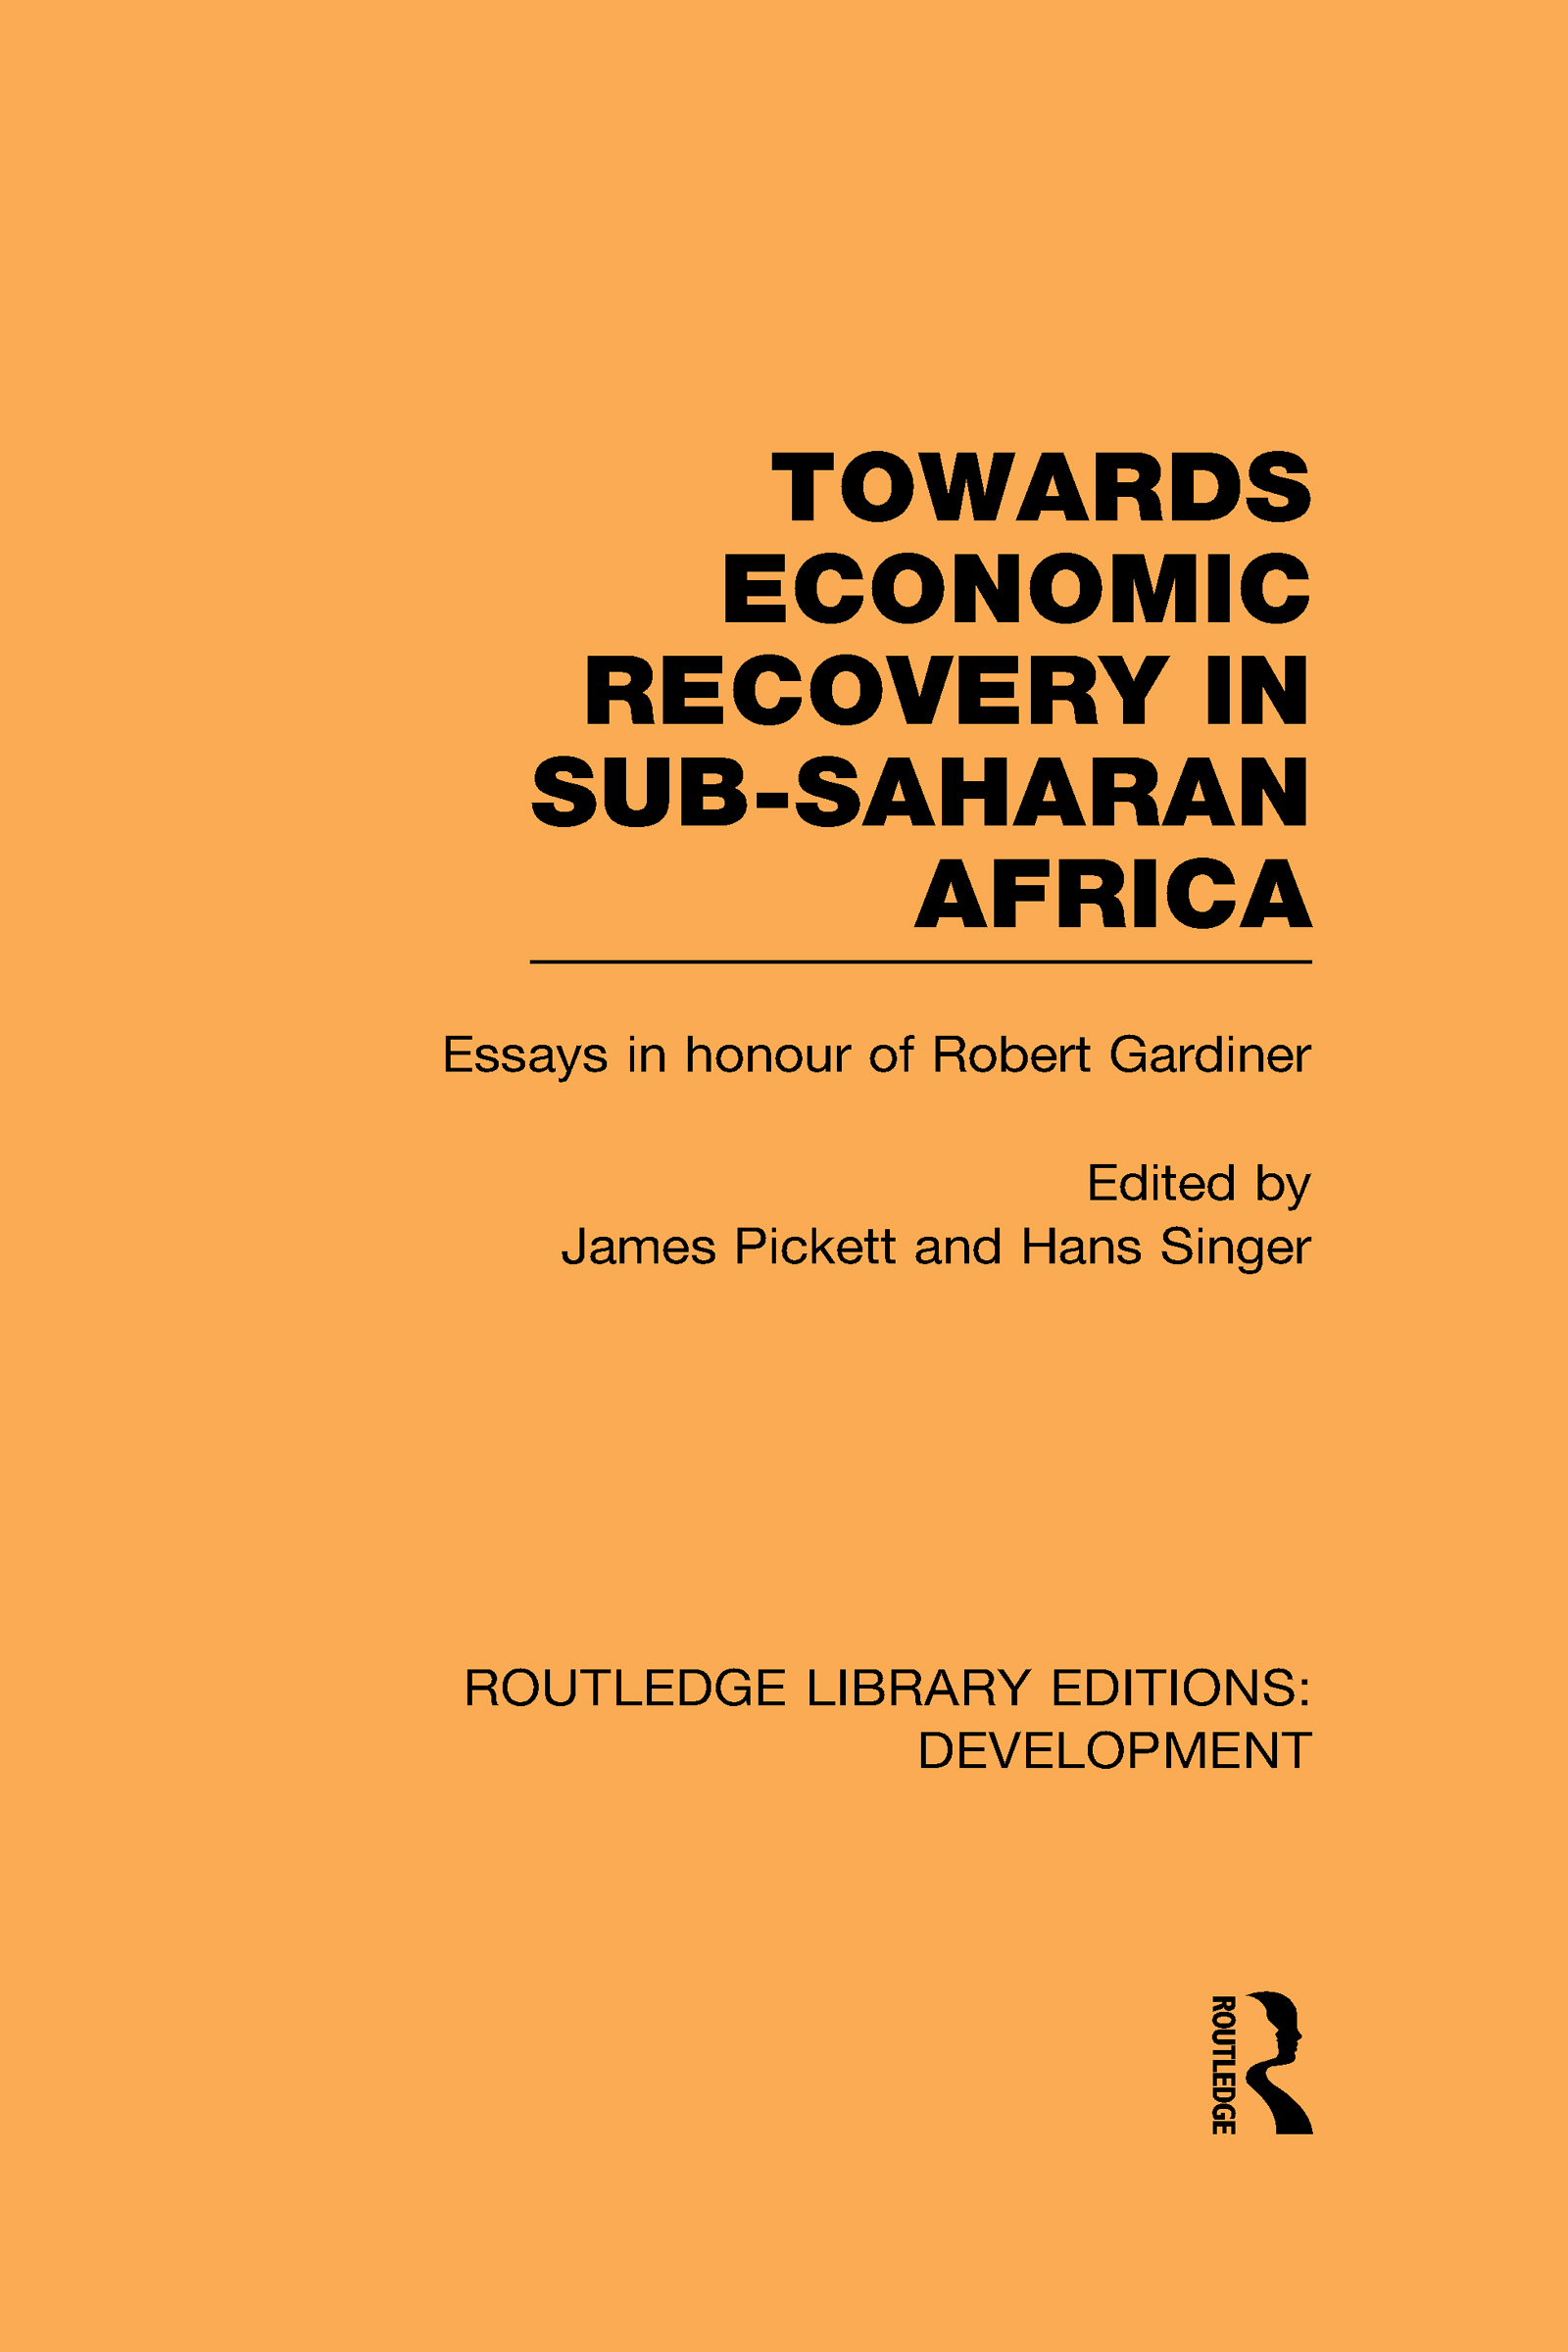 Towards Economic Recovery in Sub-Saharan Africa: Essays in Honour of Robert Gardiner (Hardback) book cover